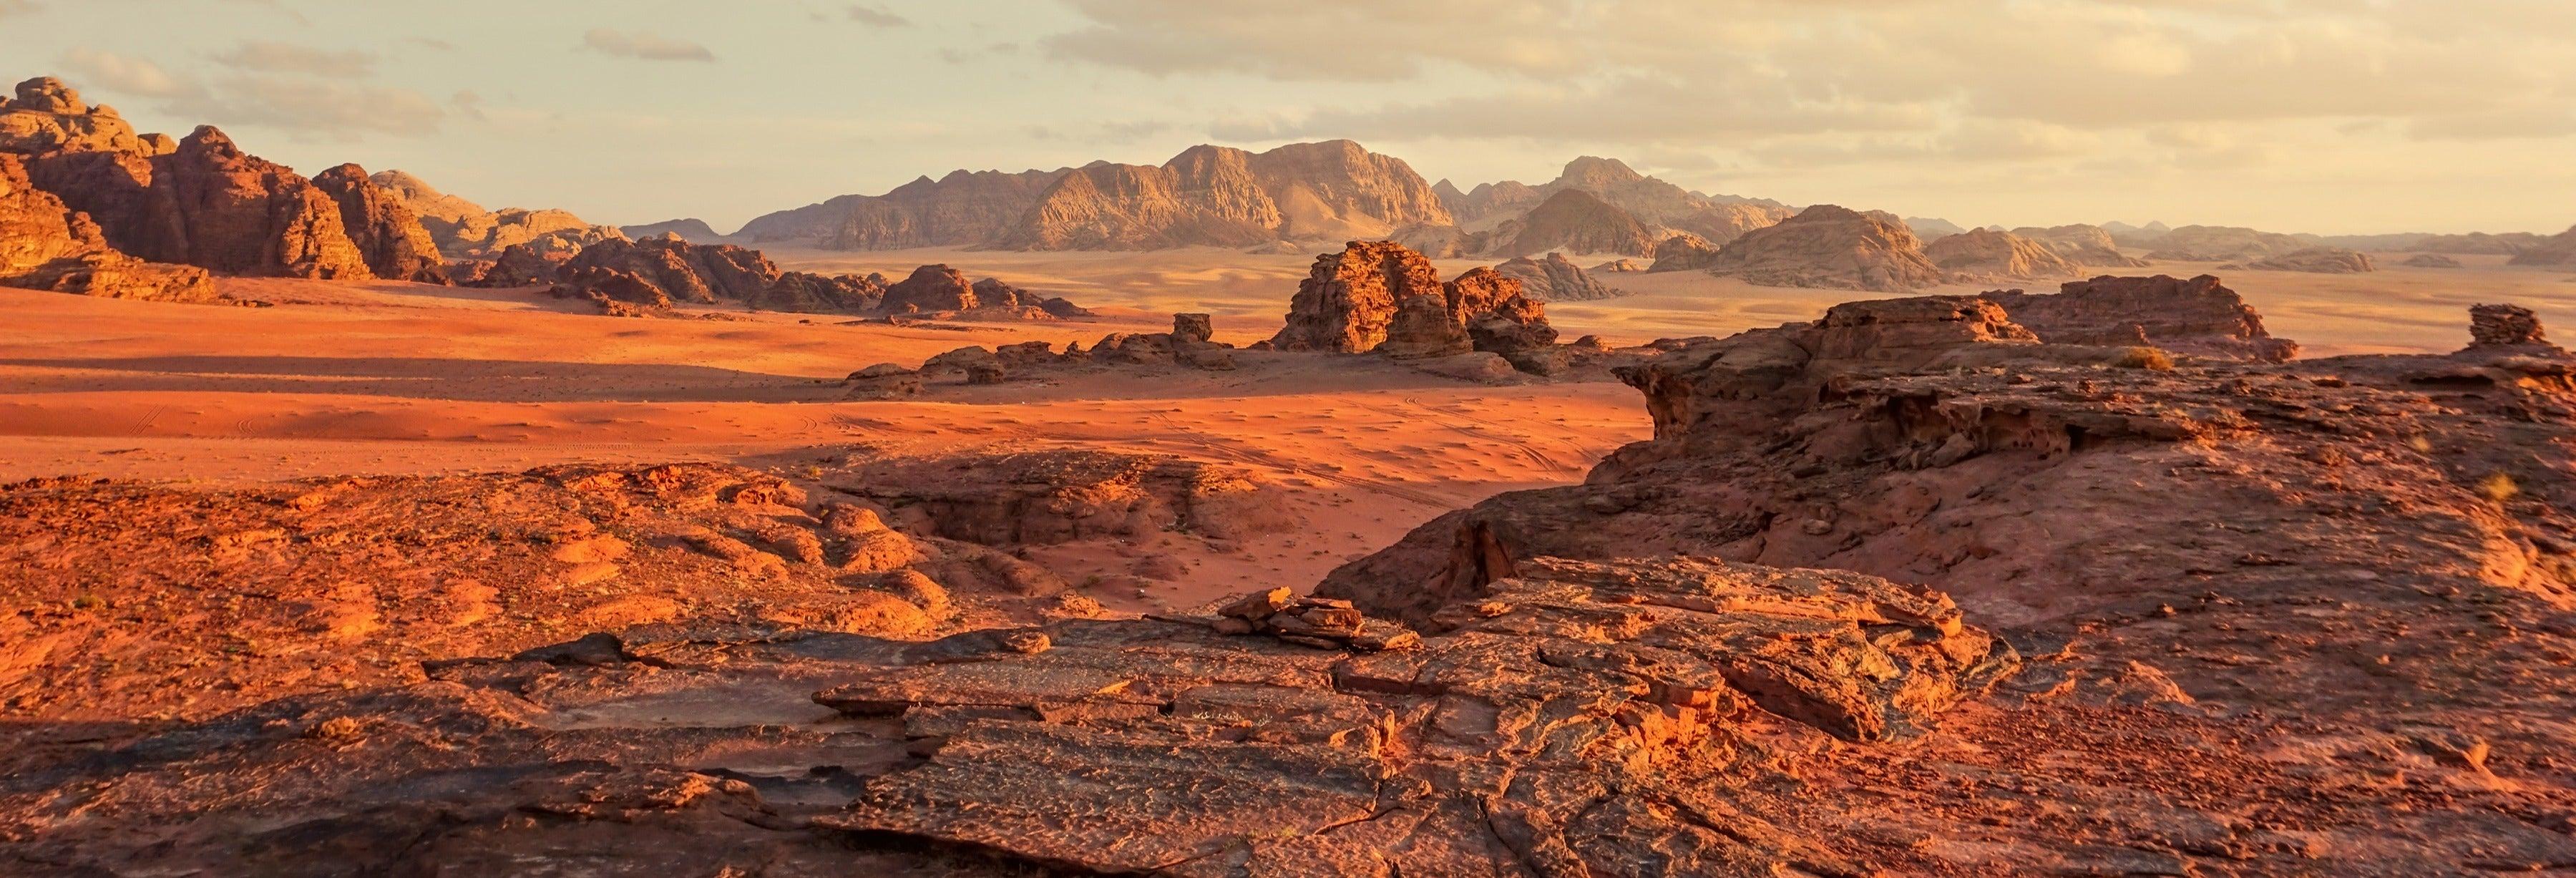 Excurson à Wadi Rum